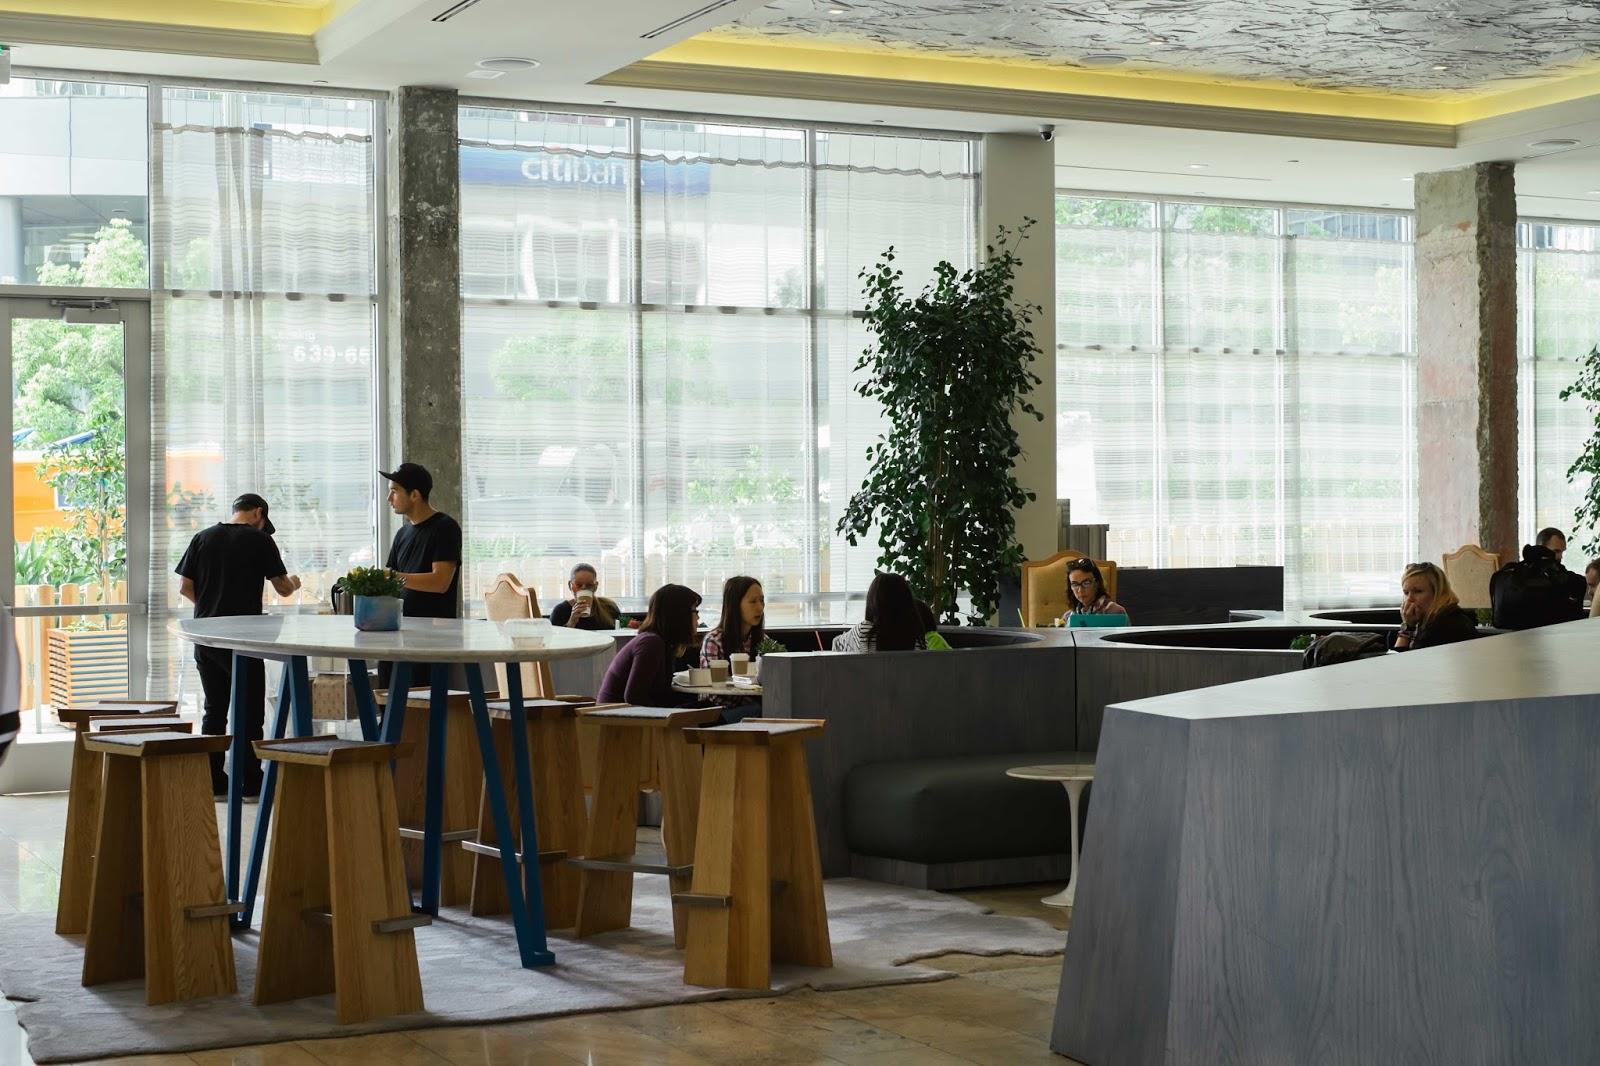 mybelonging-thelinehotel-losangeles-koreatown-hoteltonight-htinsider-37.jpg